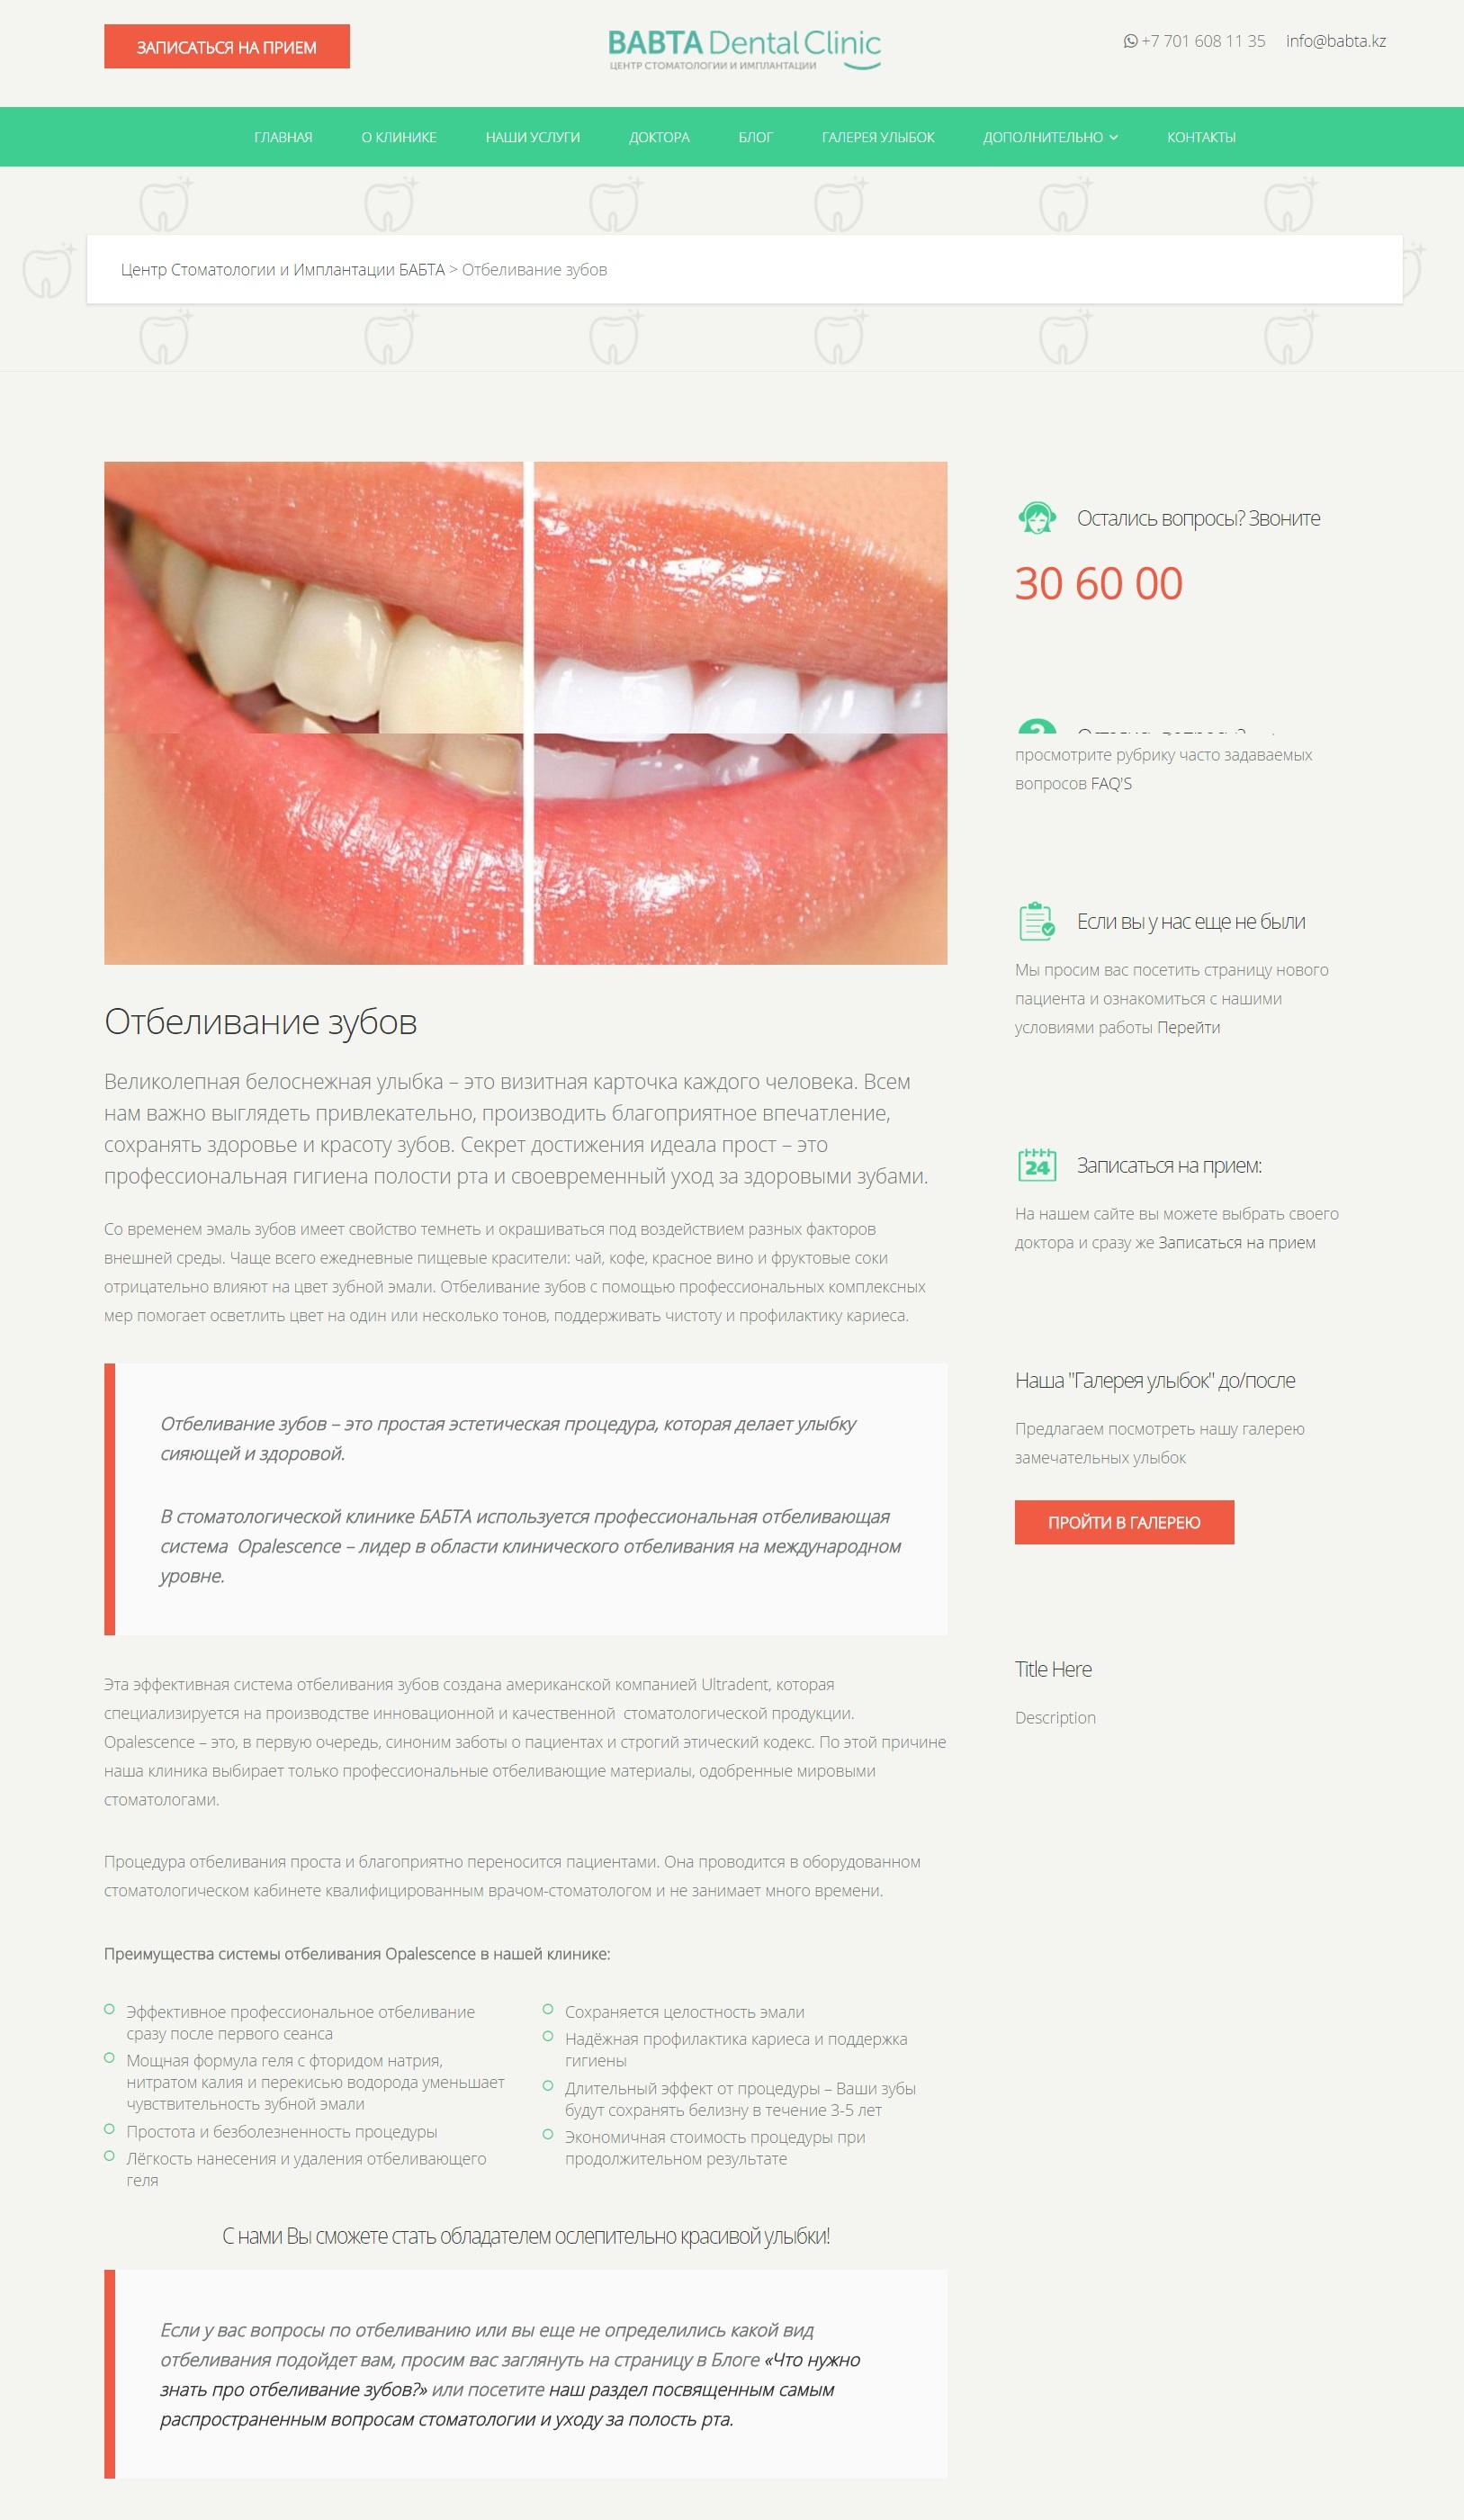 Услуги стоматолога: Отбеливание зубов